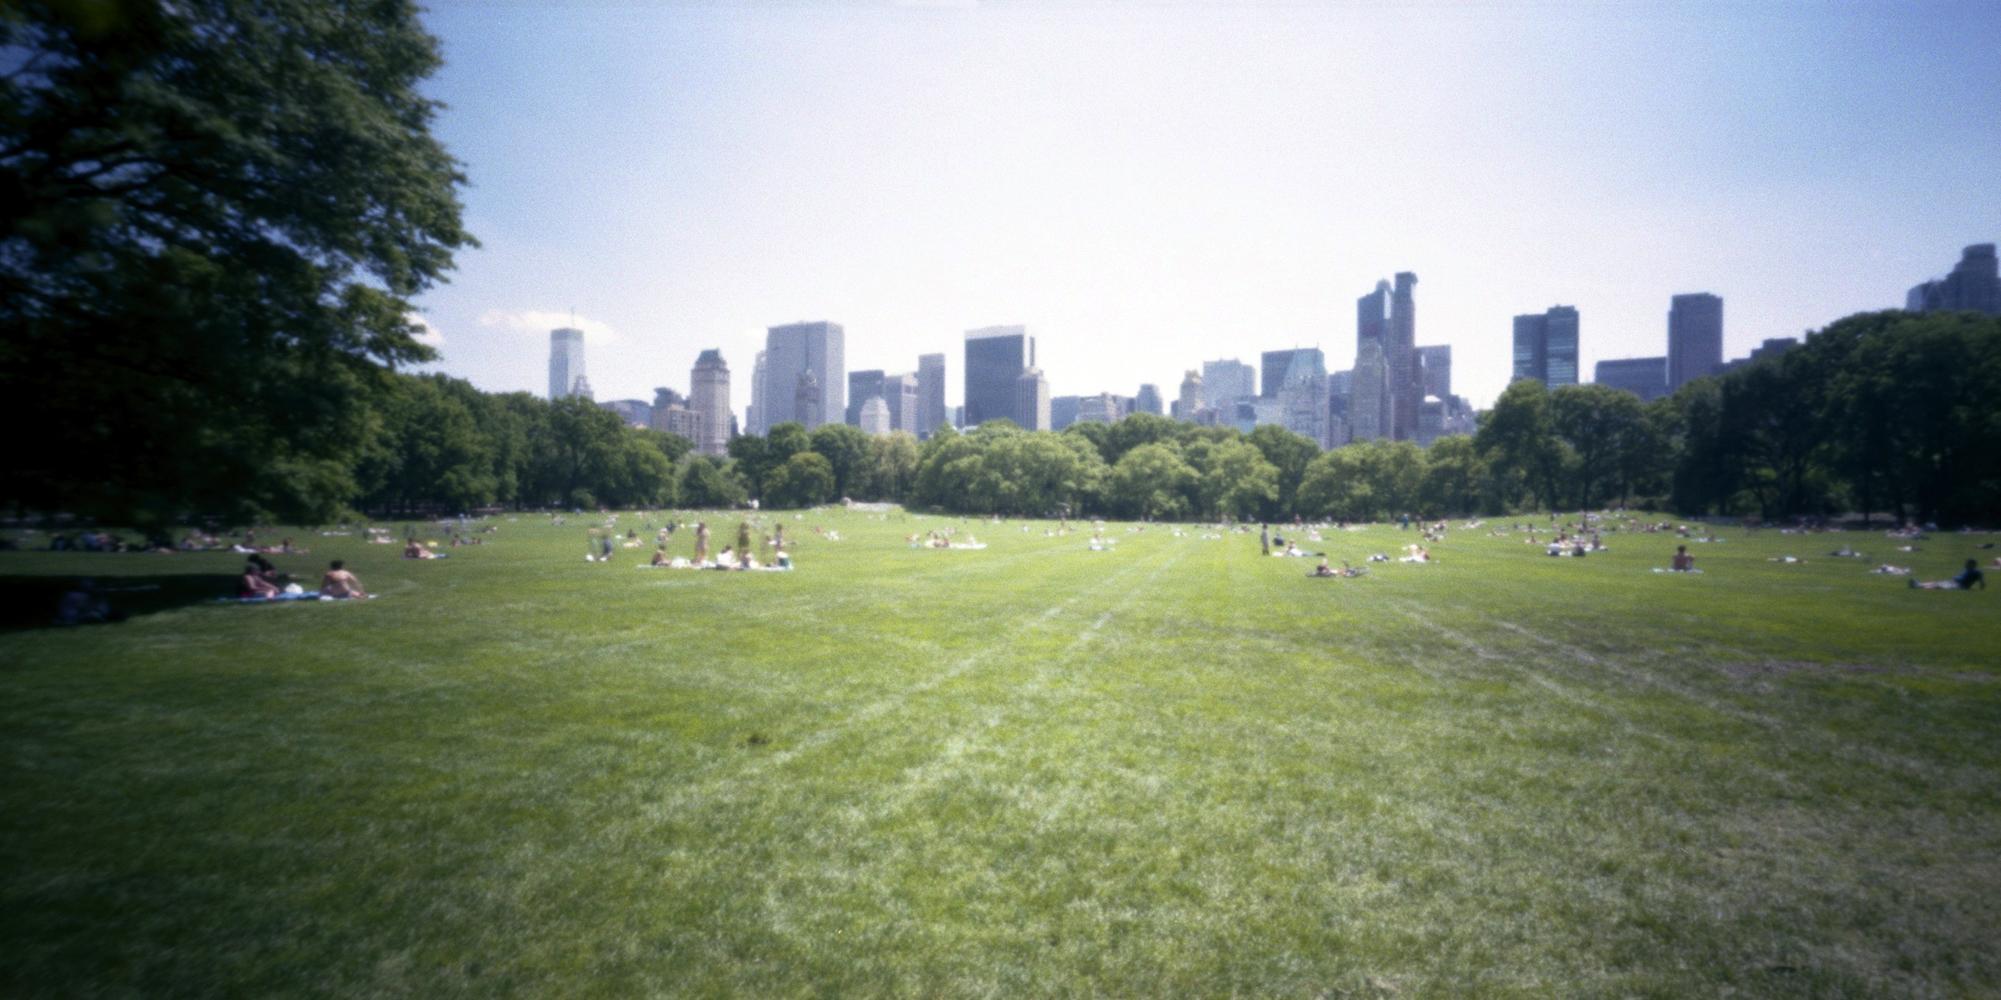 Central Park, New York, USA.